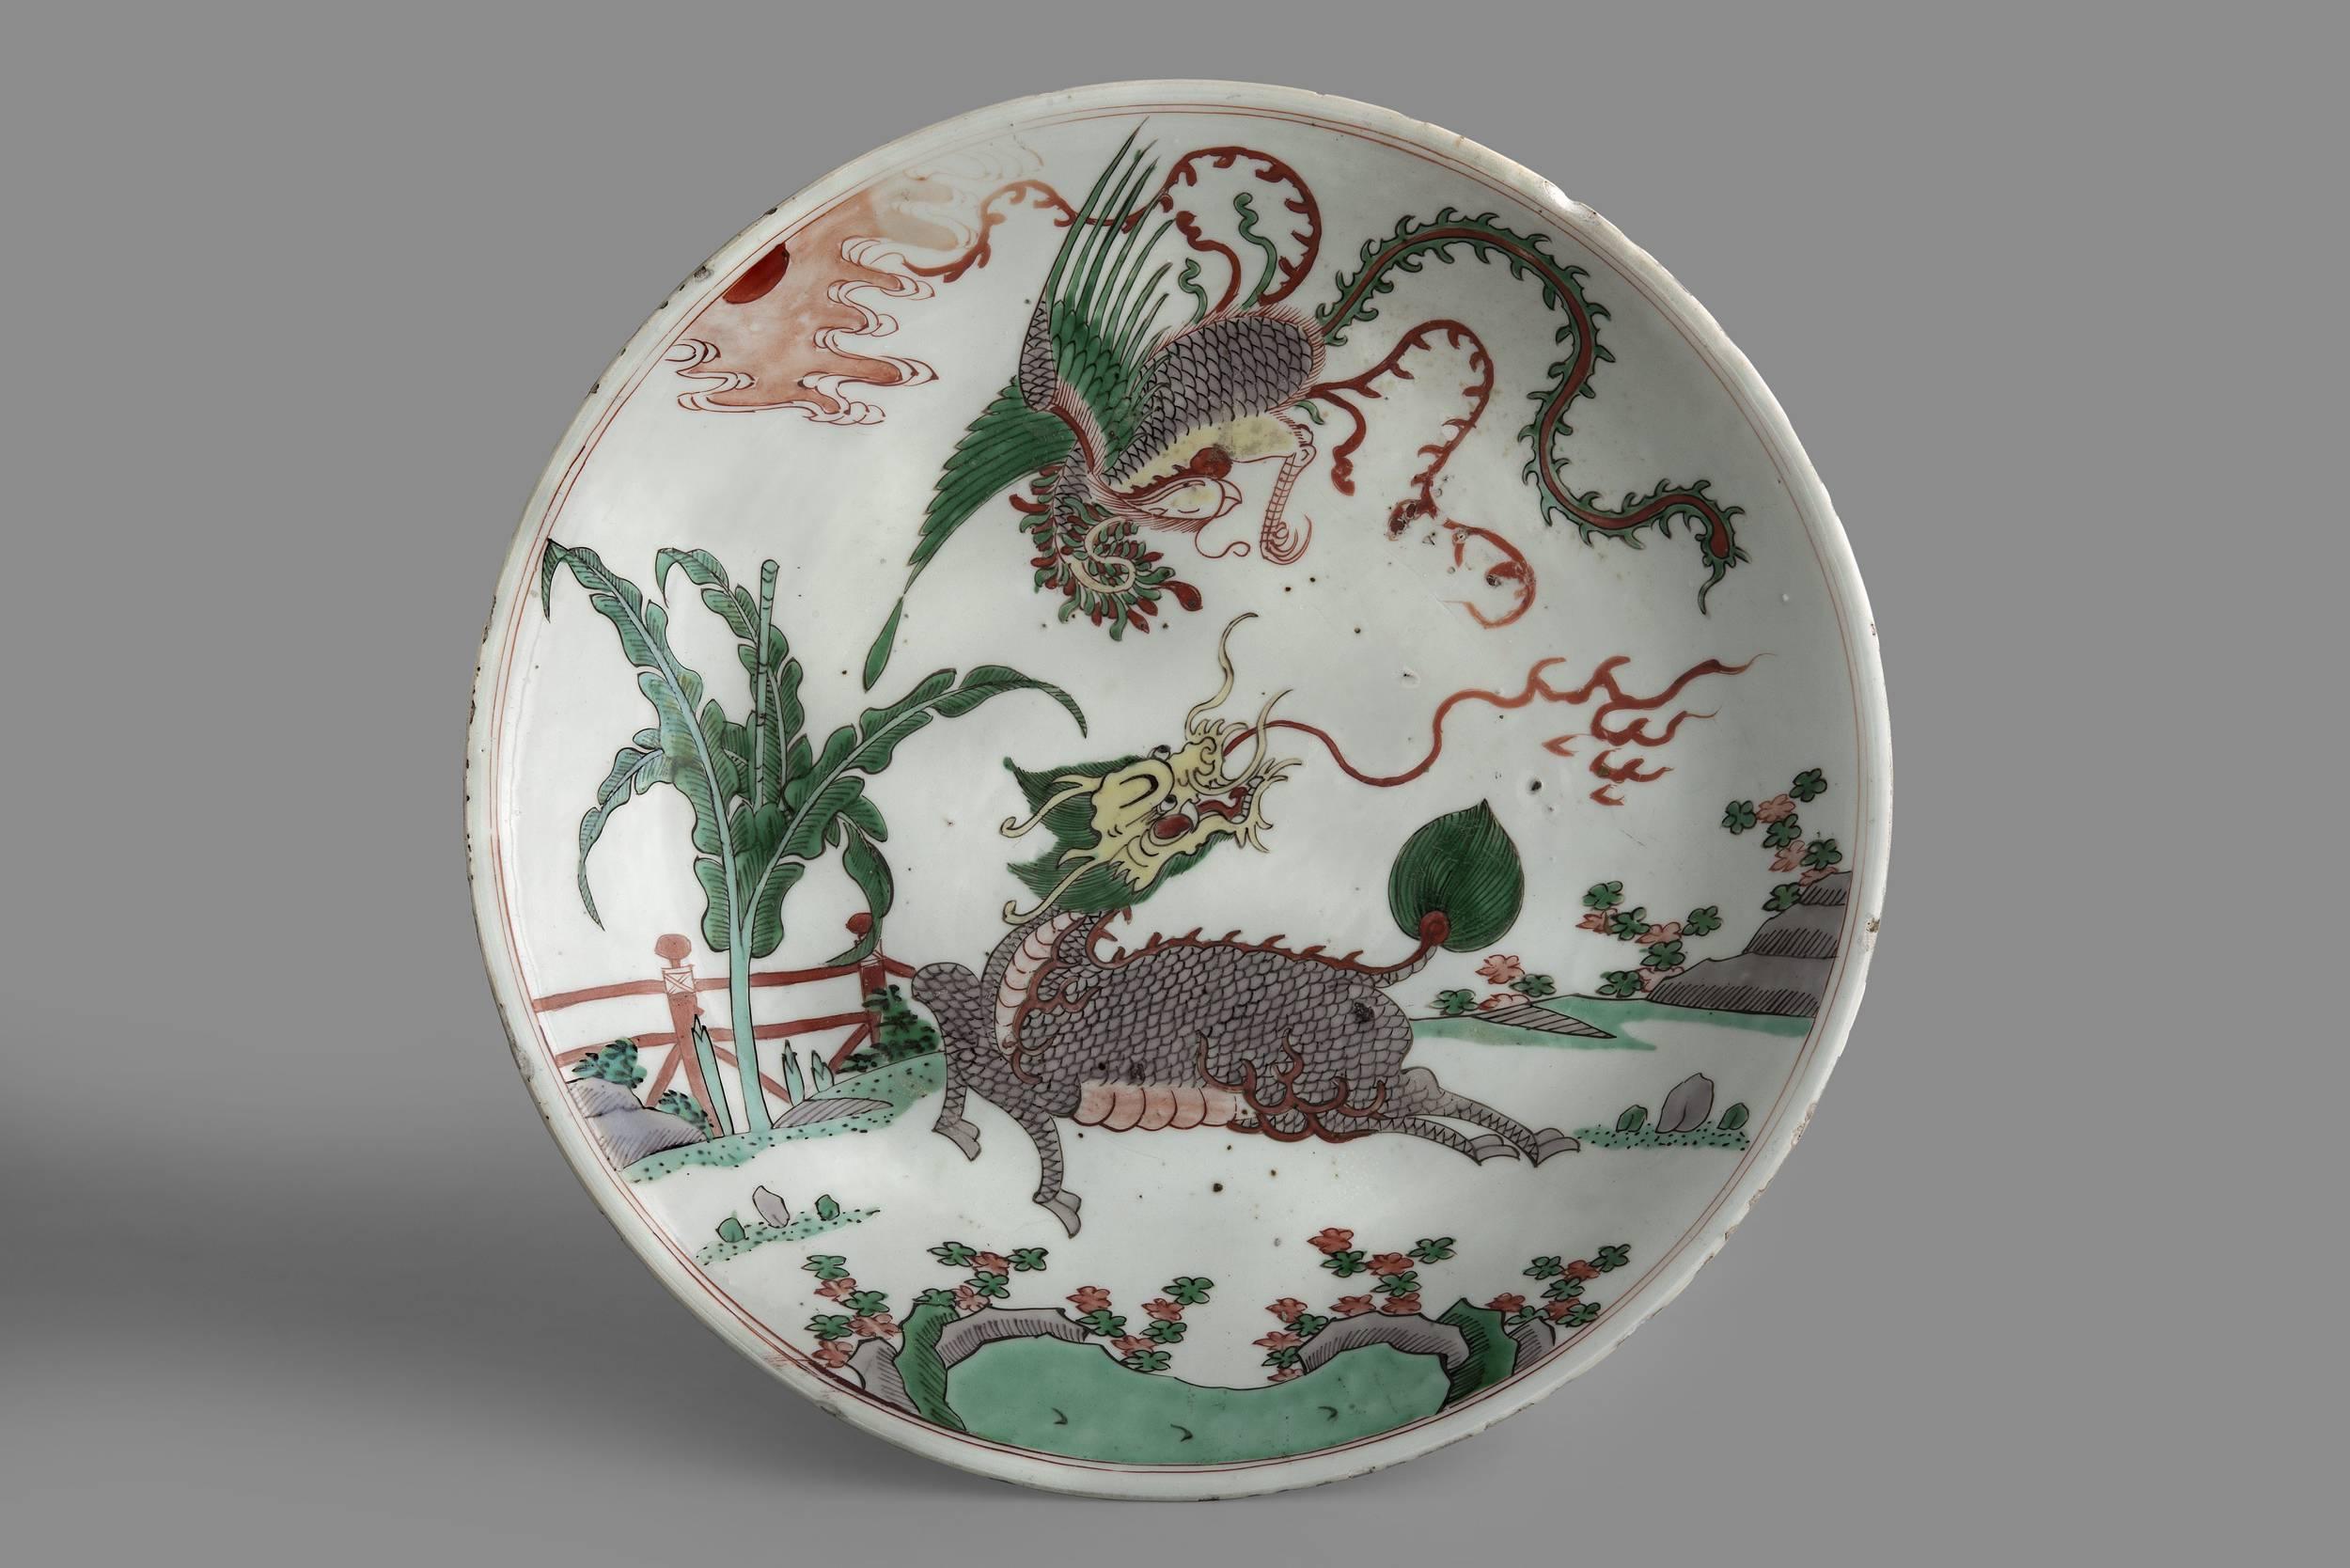 Decorative platter, 18/19th century